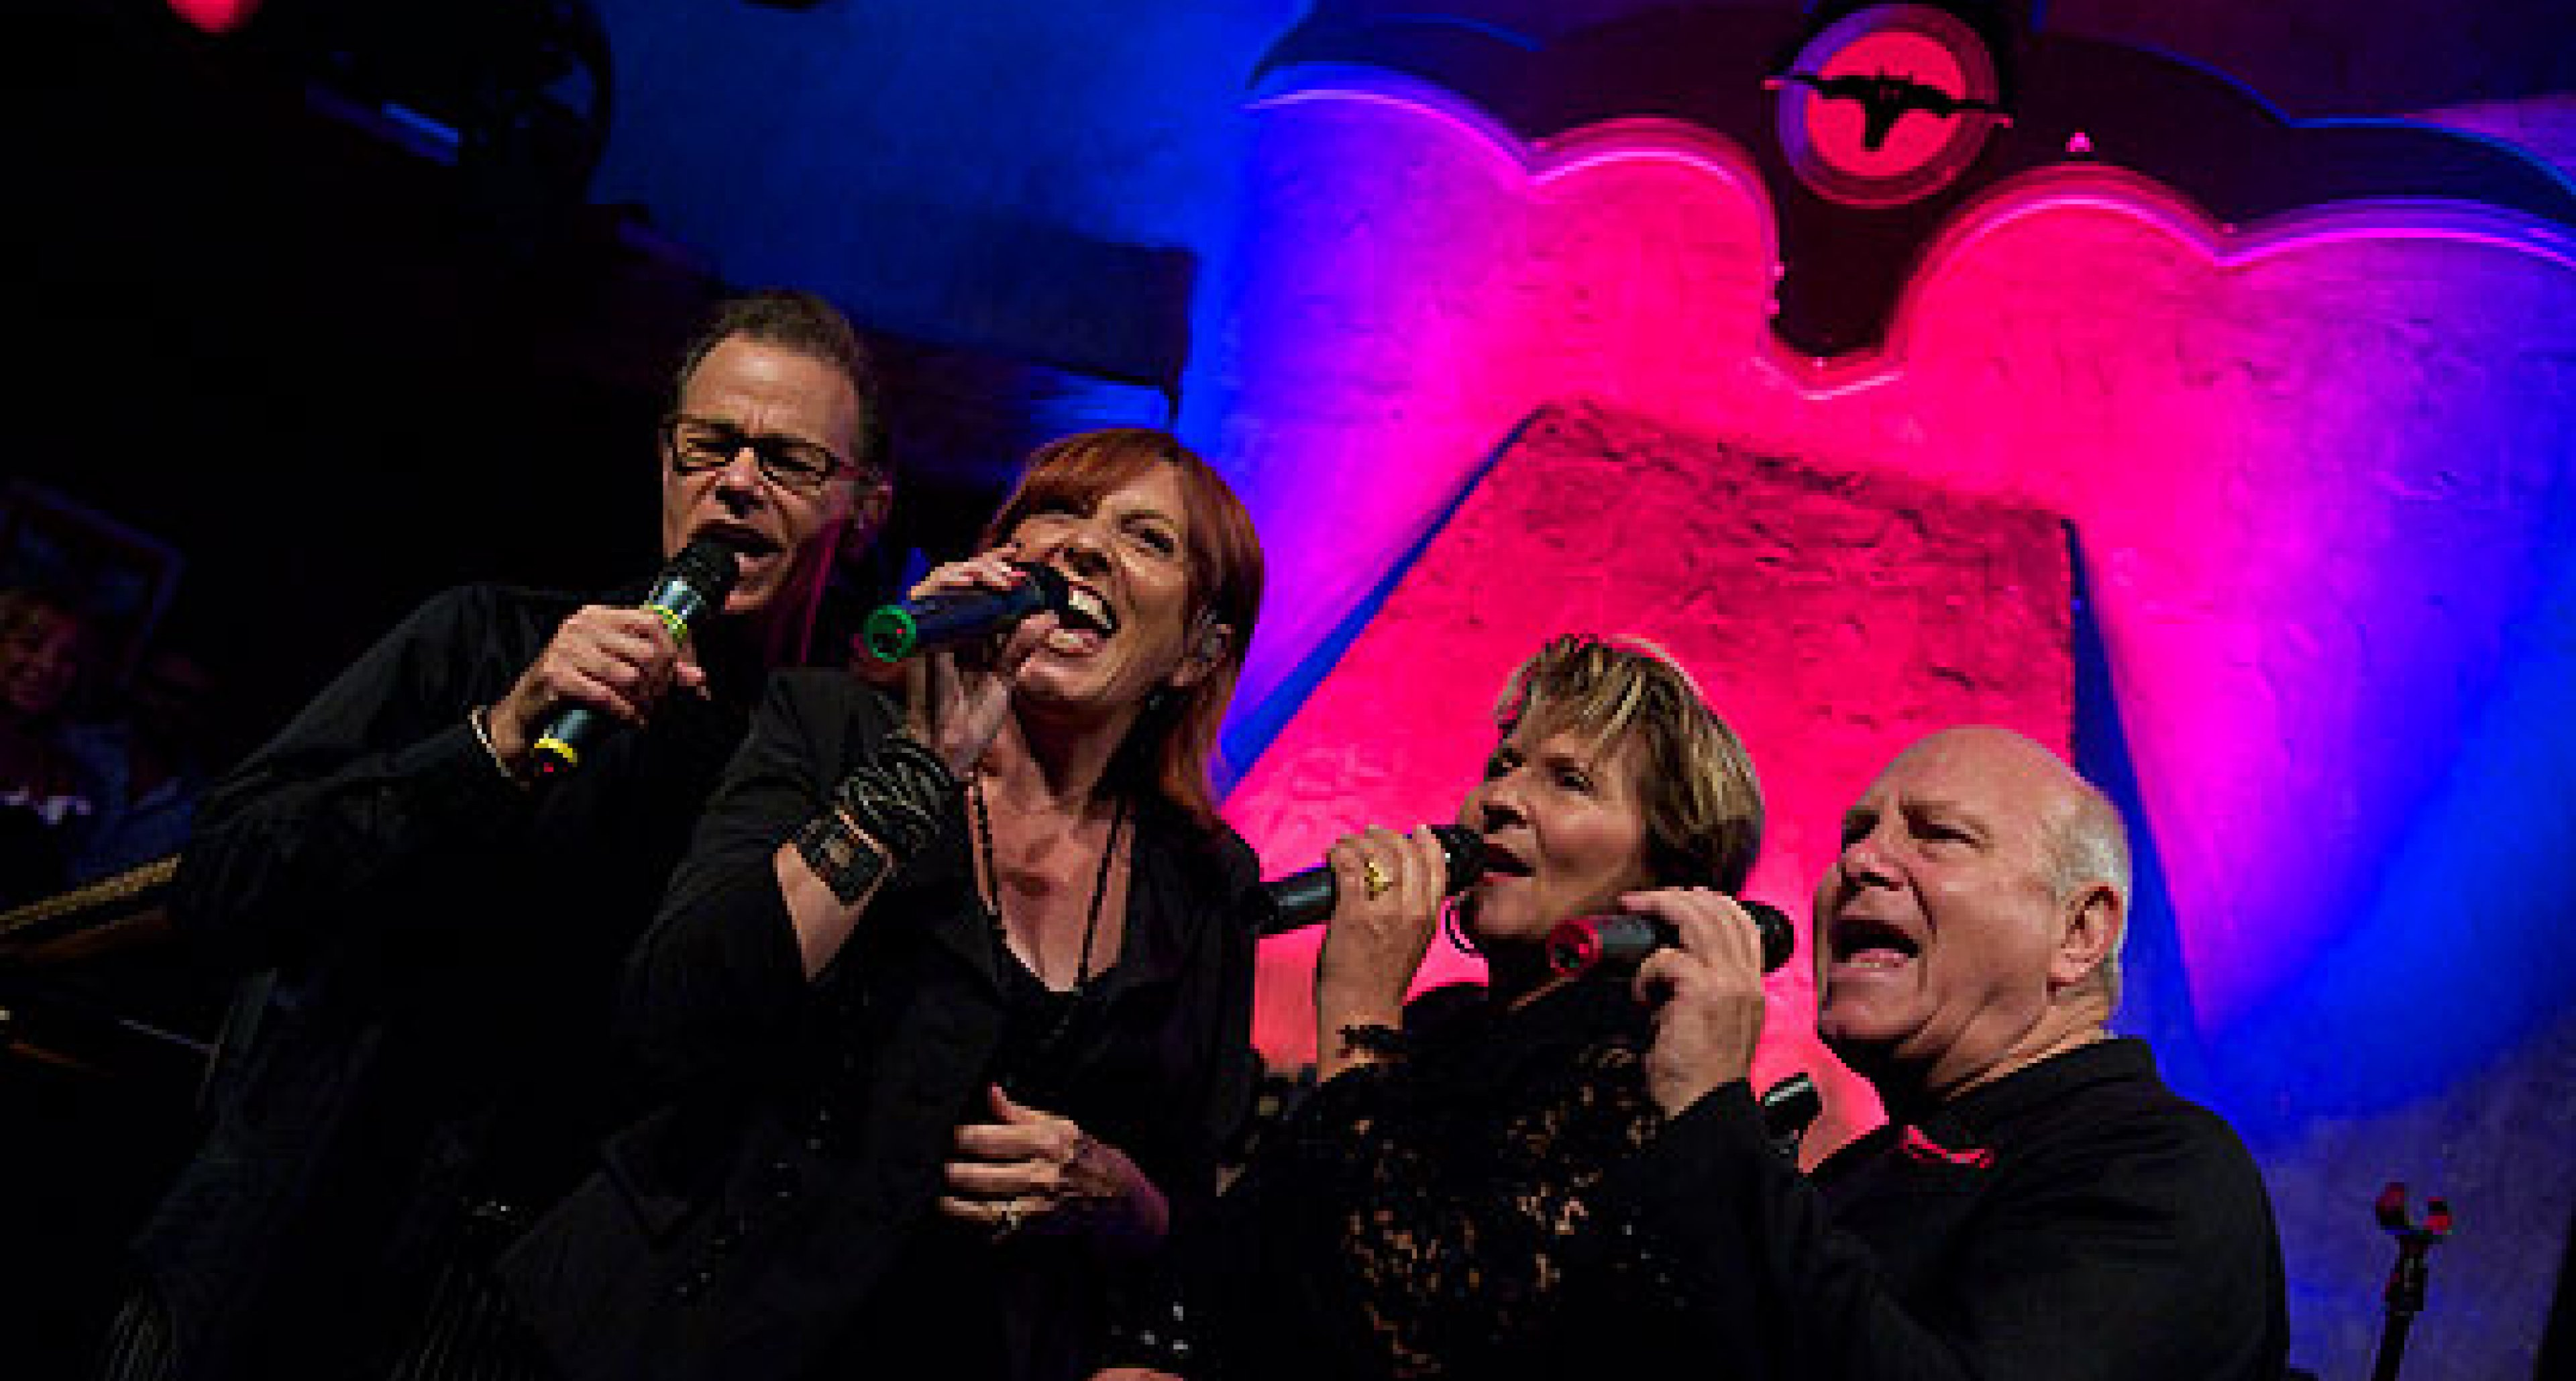 Festival da Jazz in St. Moritz: live at the Dracula Club